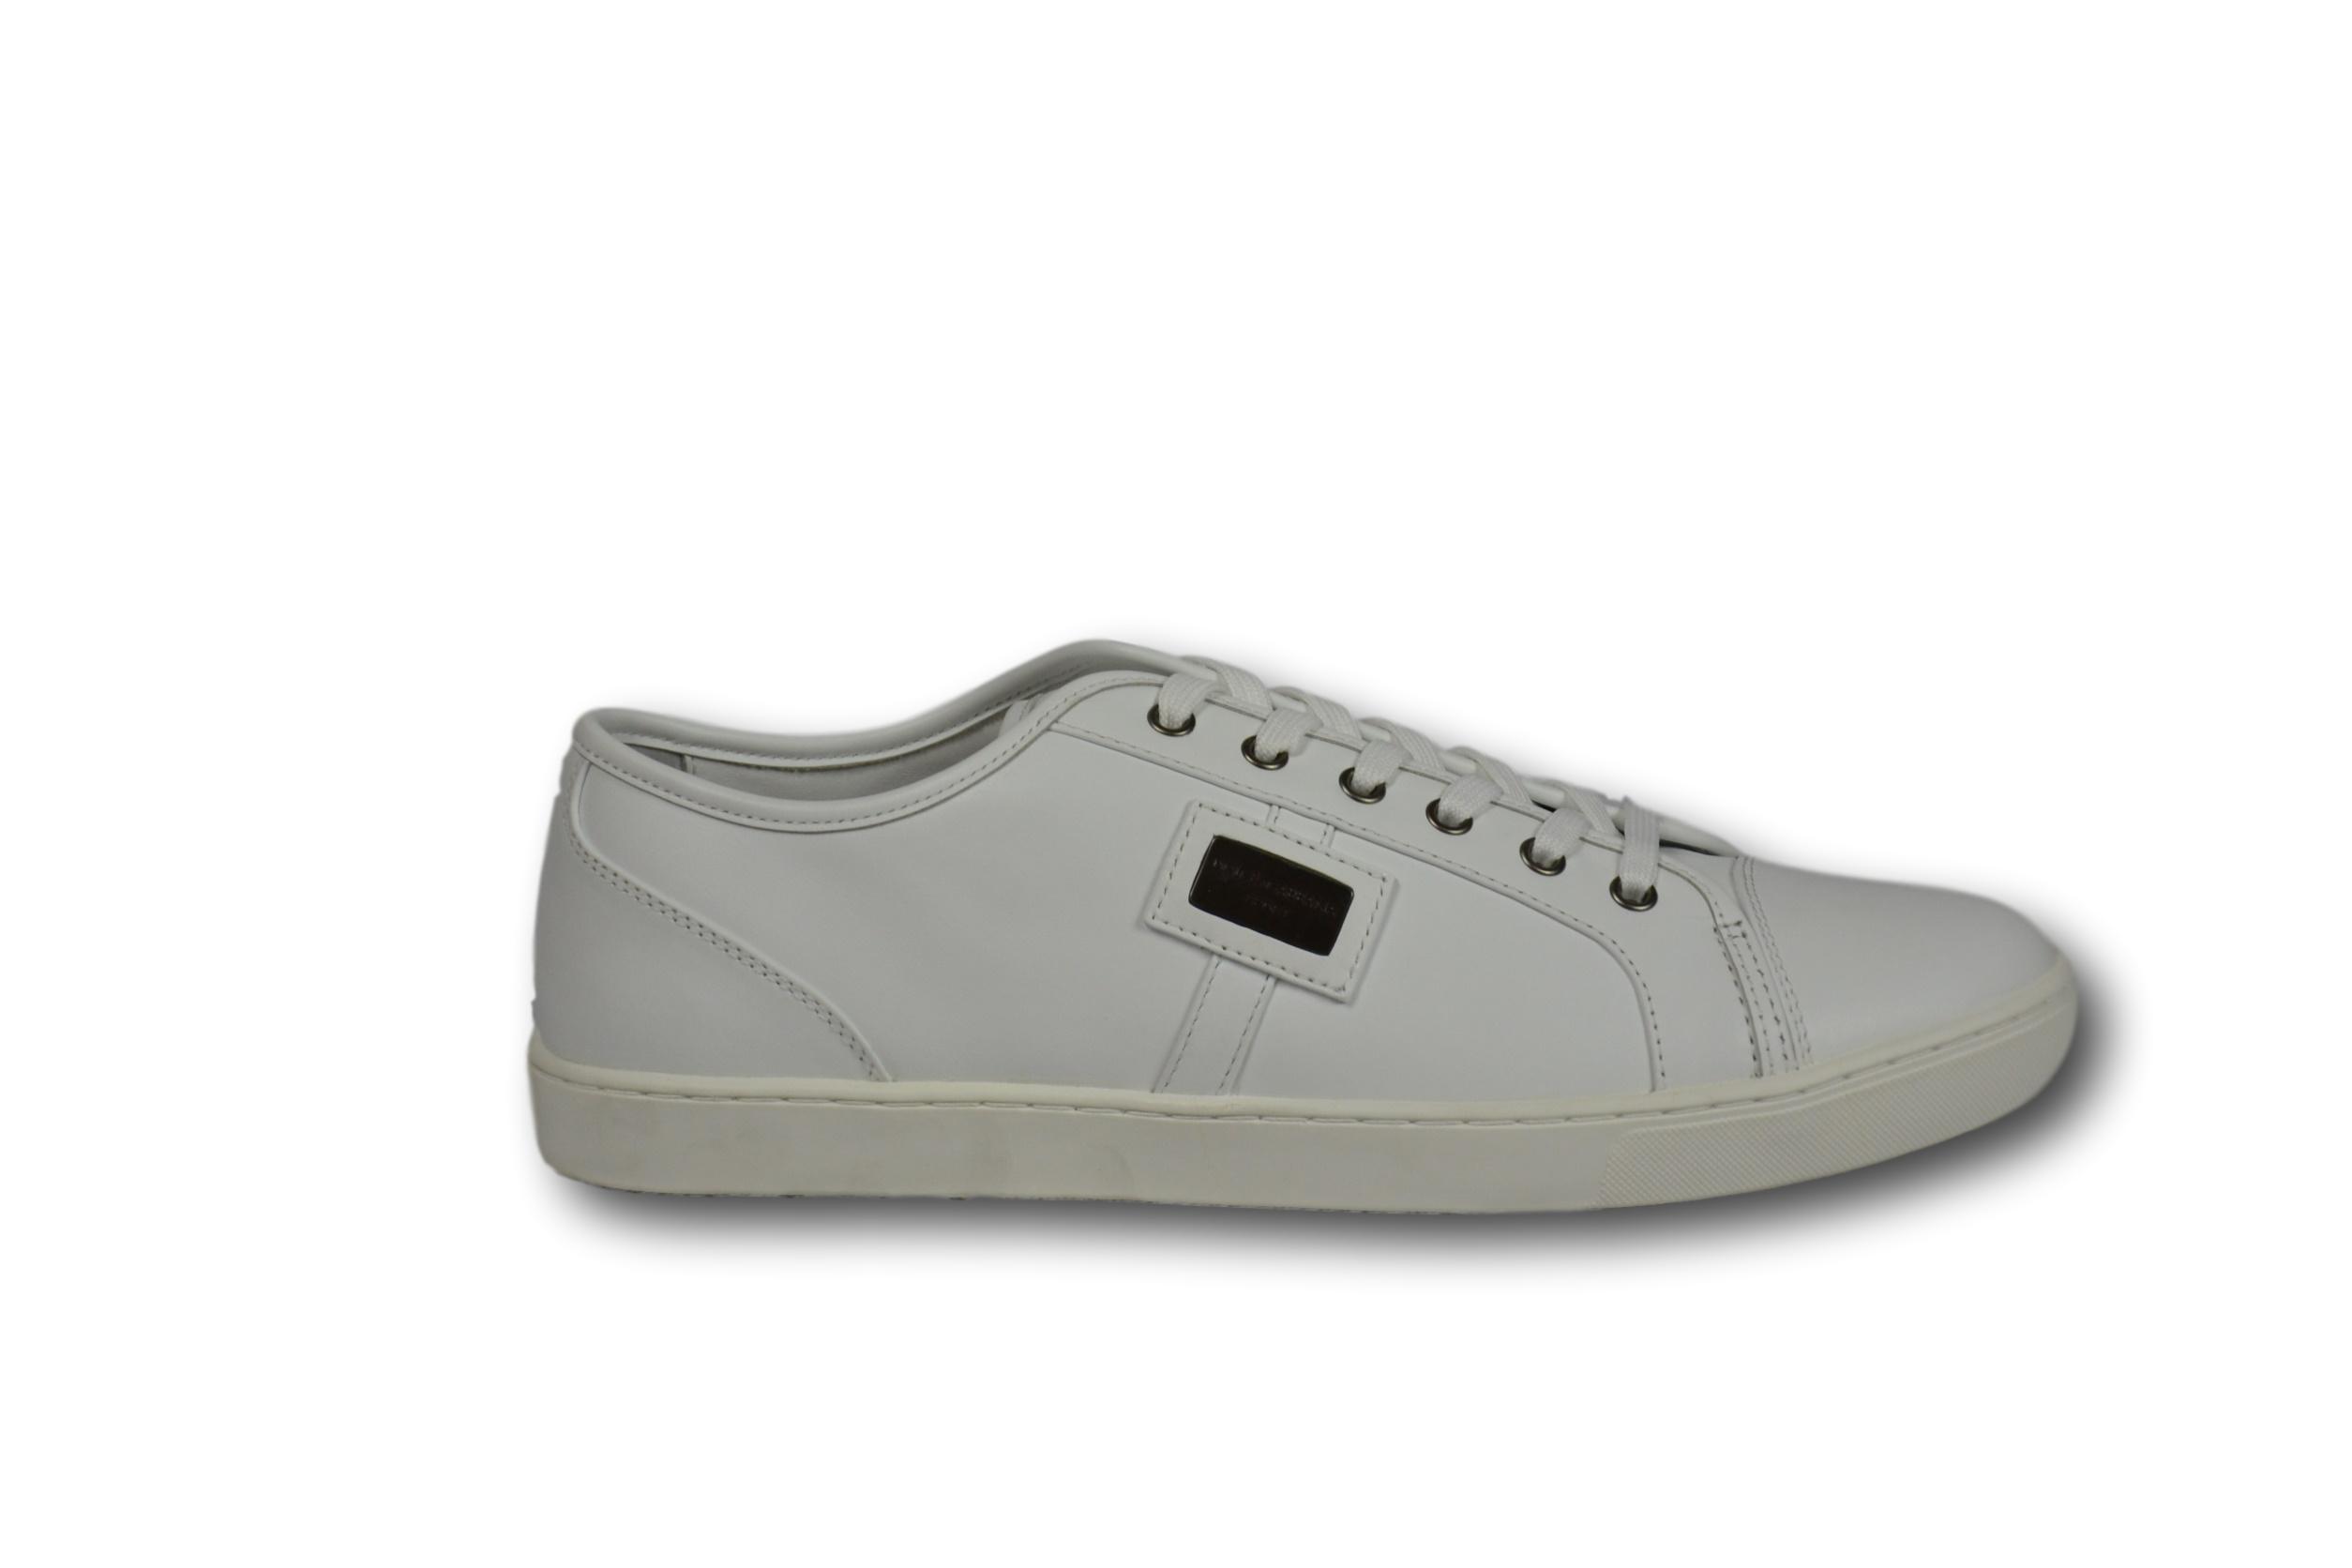 DOLCE   GABBANA D   G Scarpe Sneakers Uomo Pelle Man Bianche White TG. 43 UK  9 24932709b74